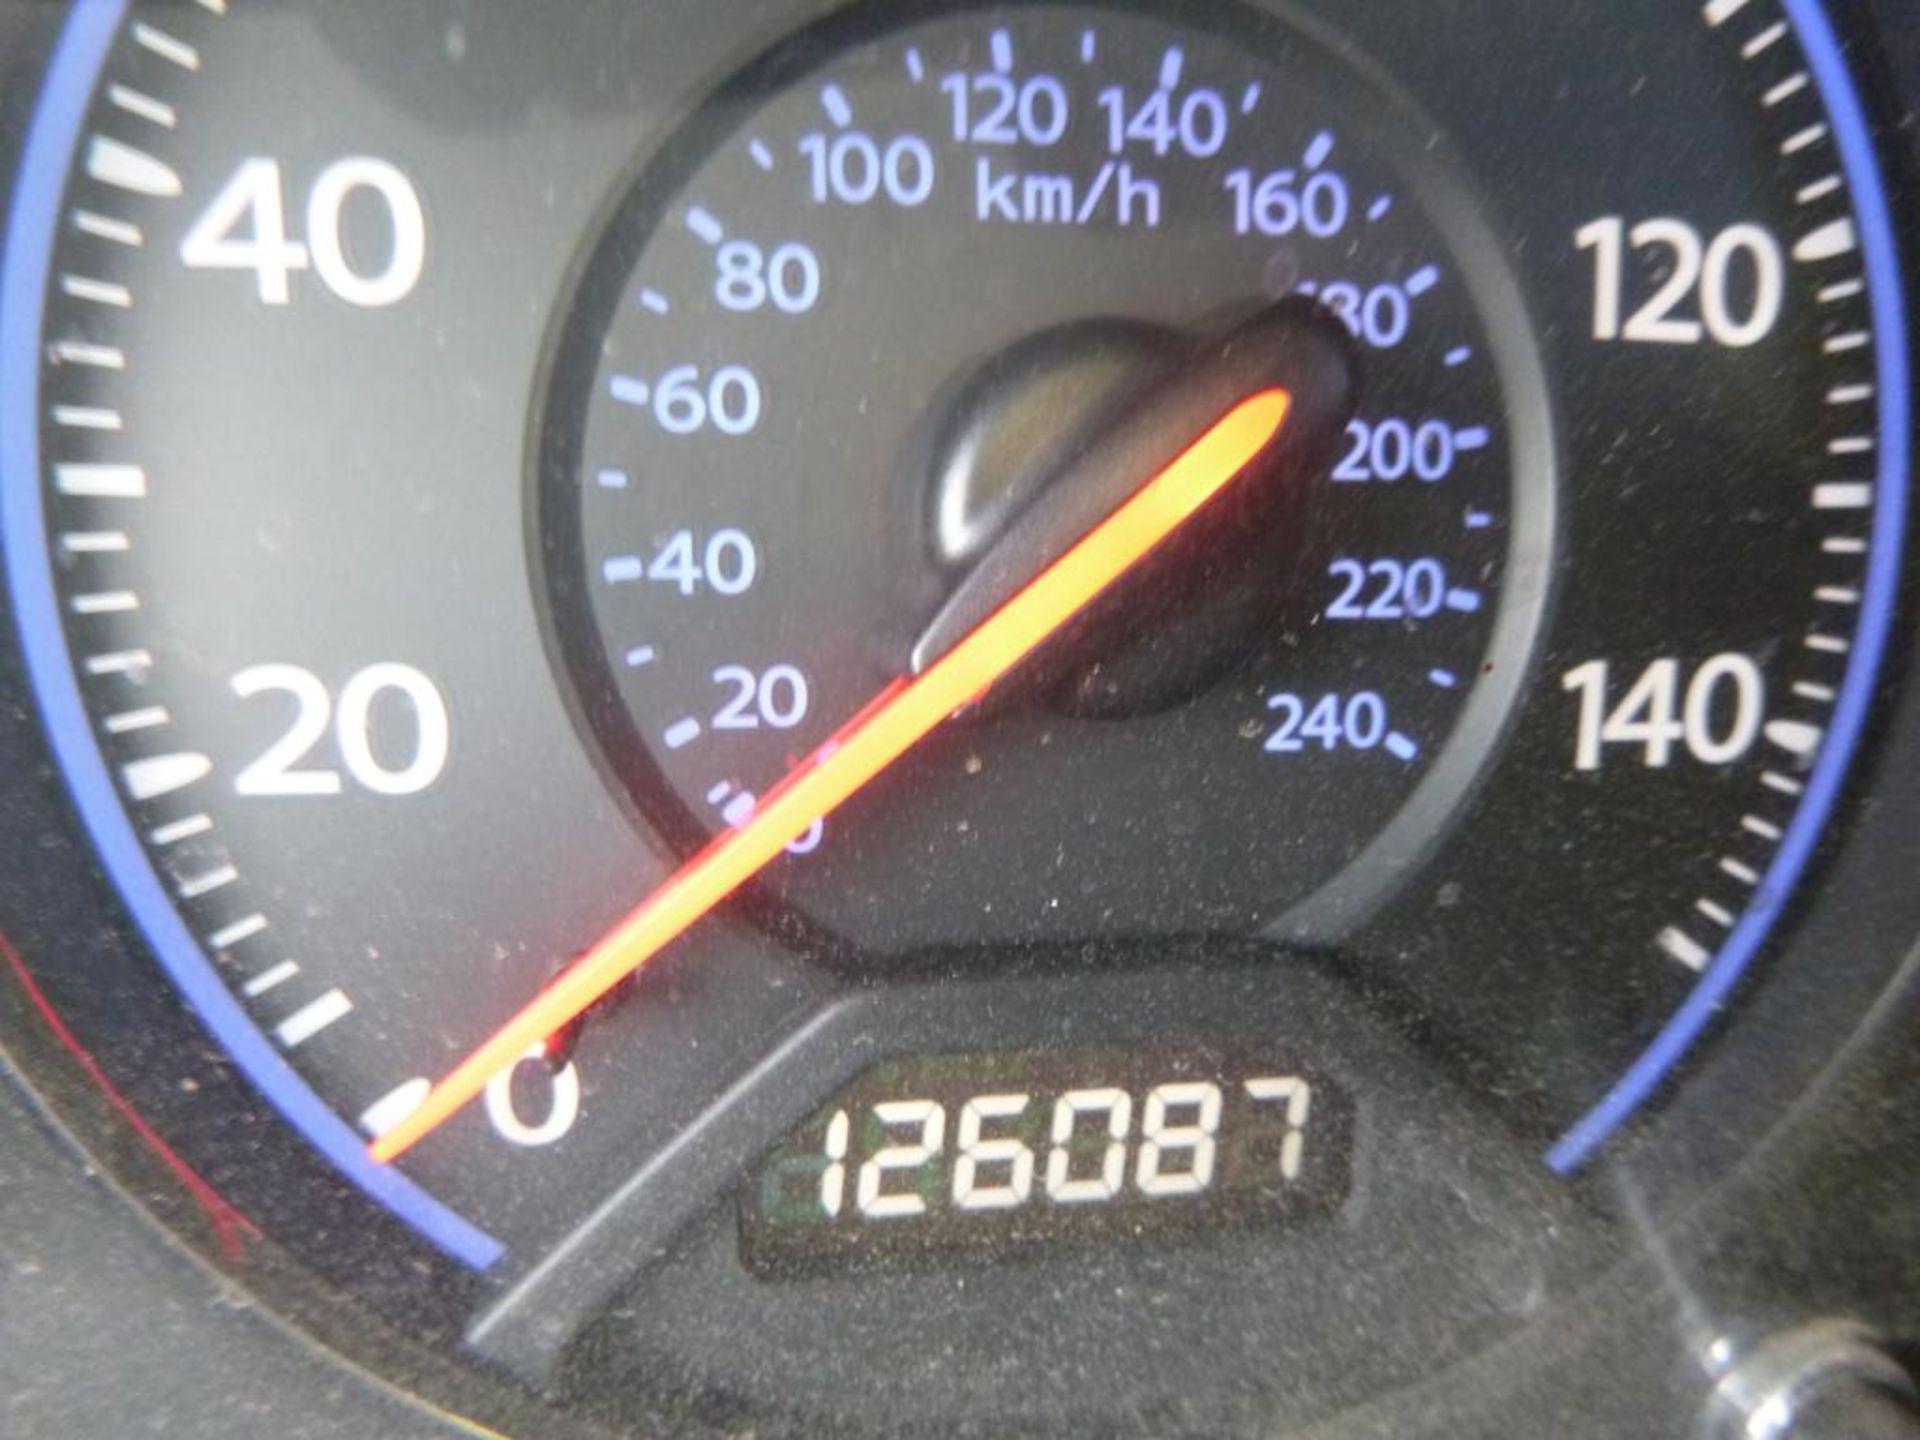 2004 Honda Civic - Image 12 of 14